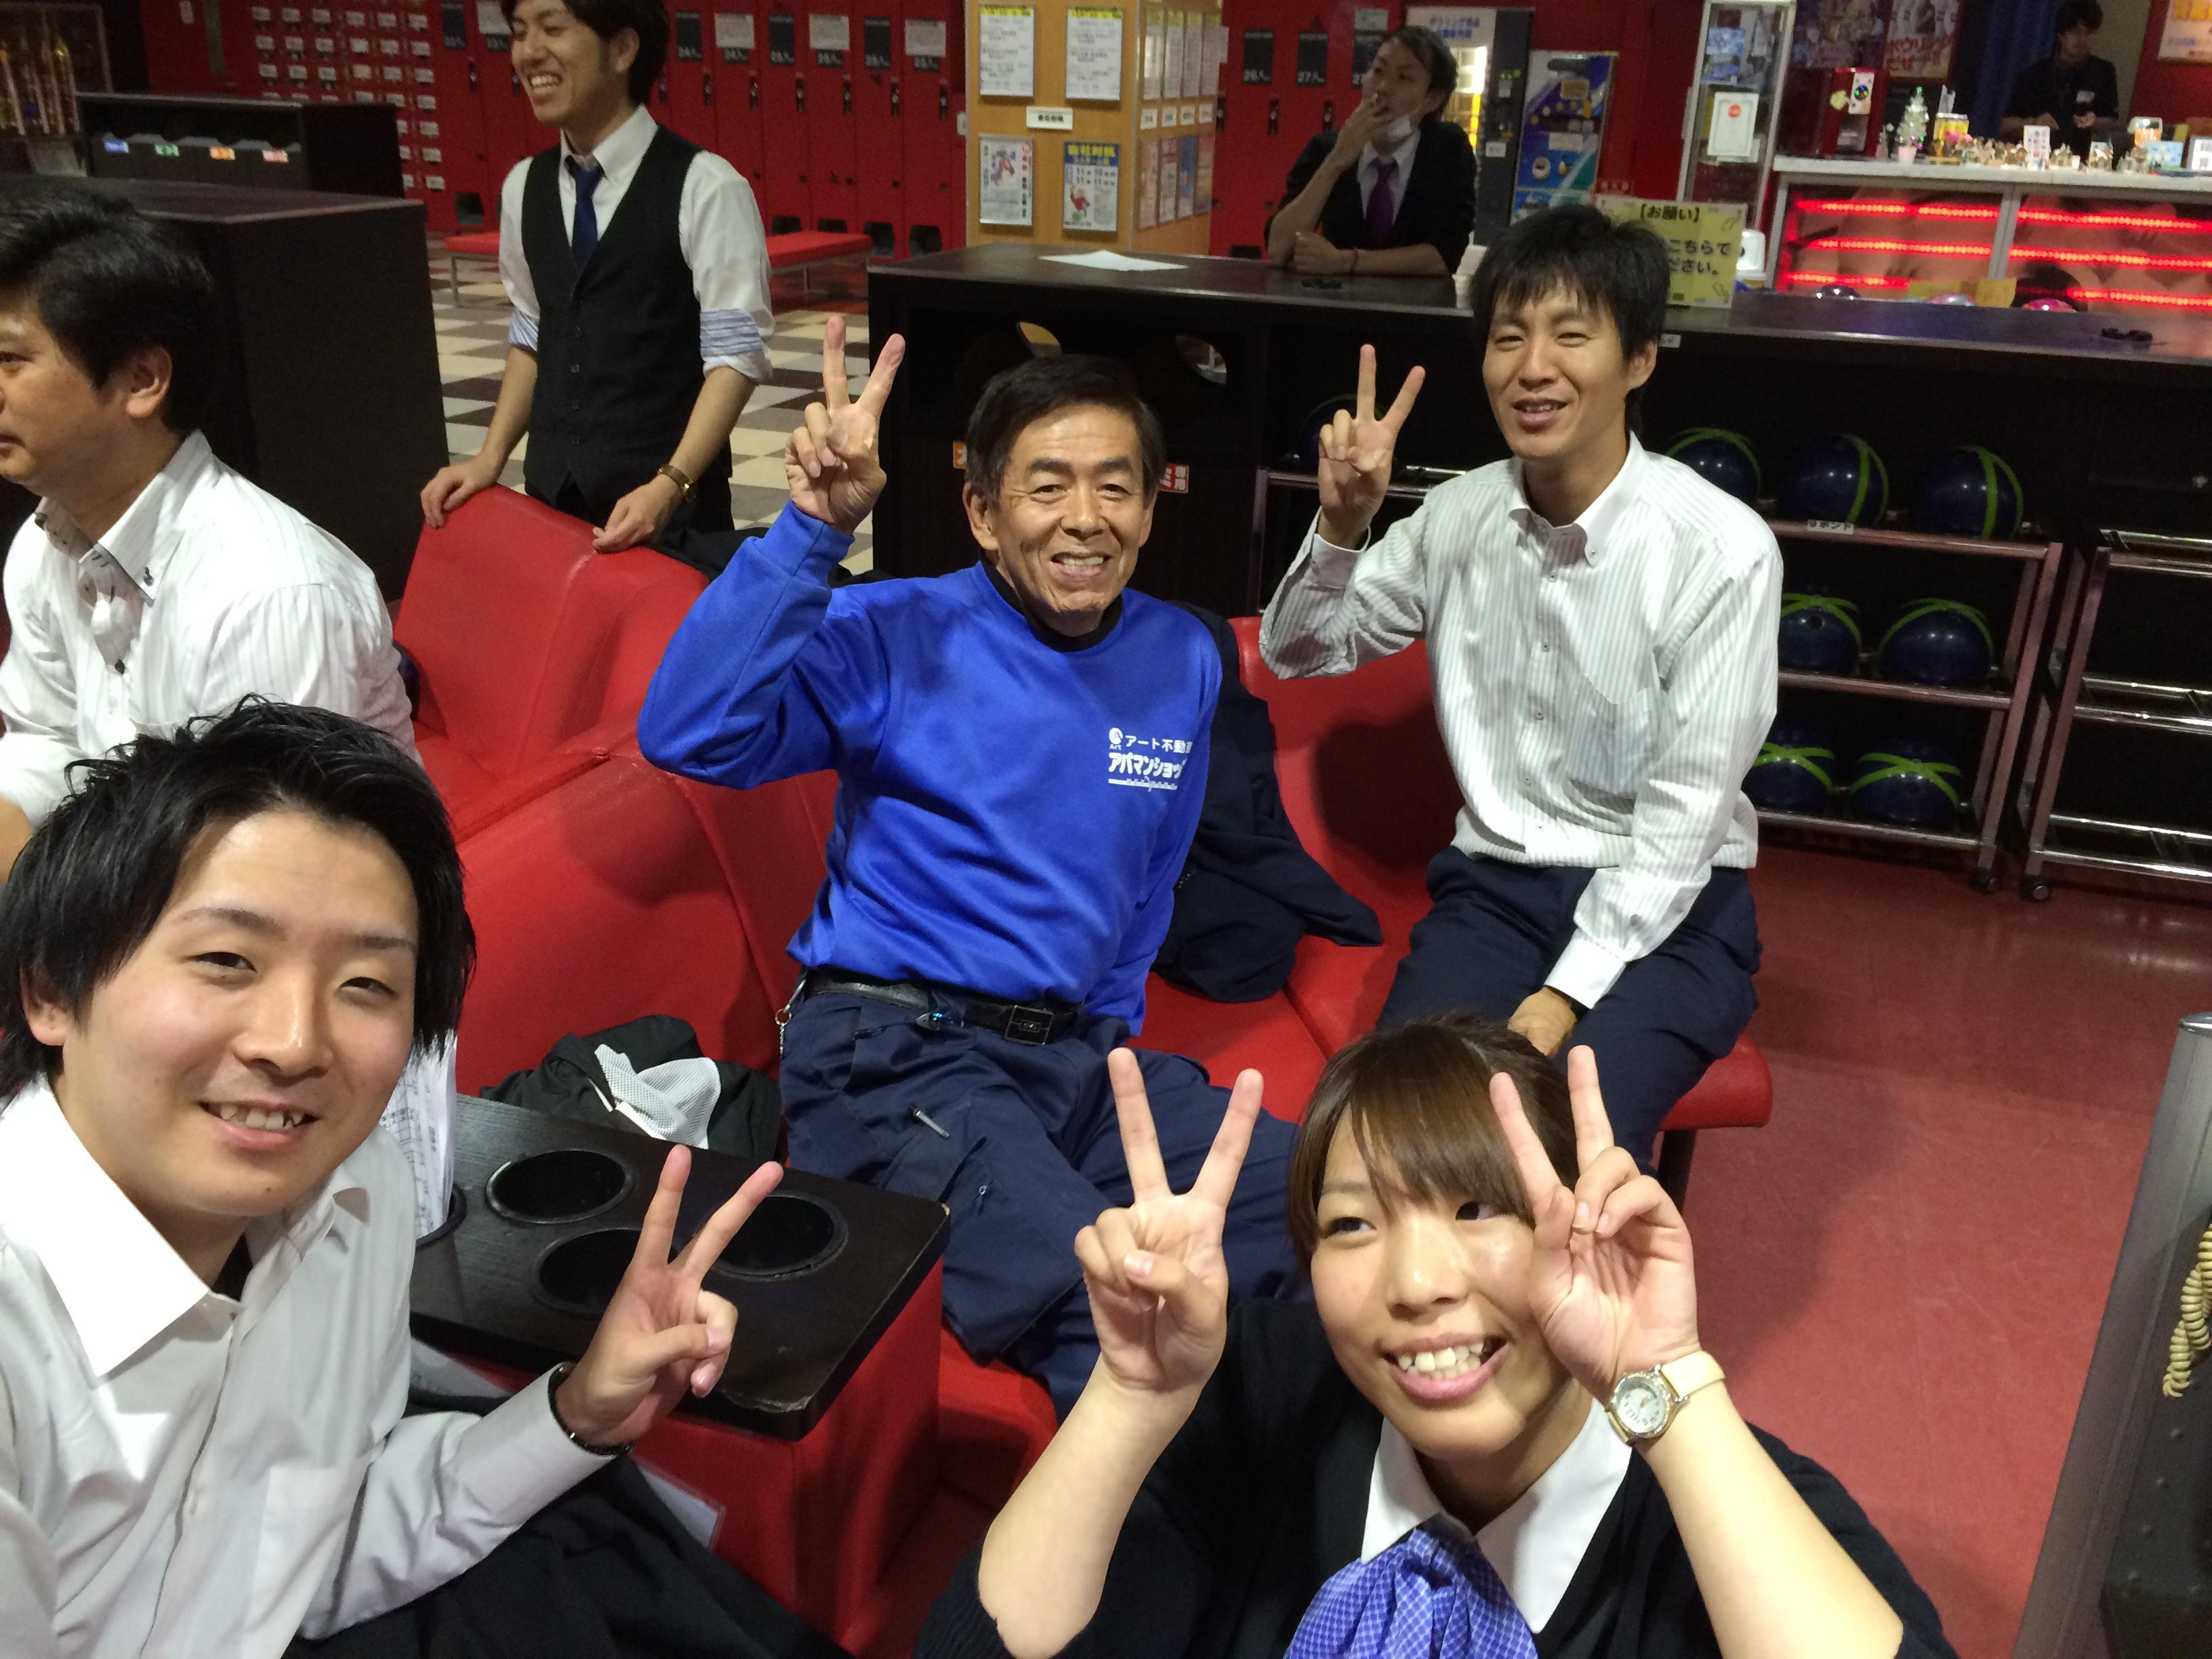 IMG_4732.JPG